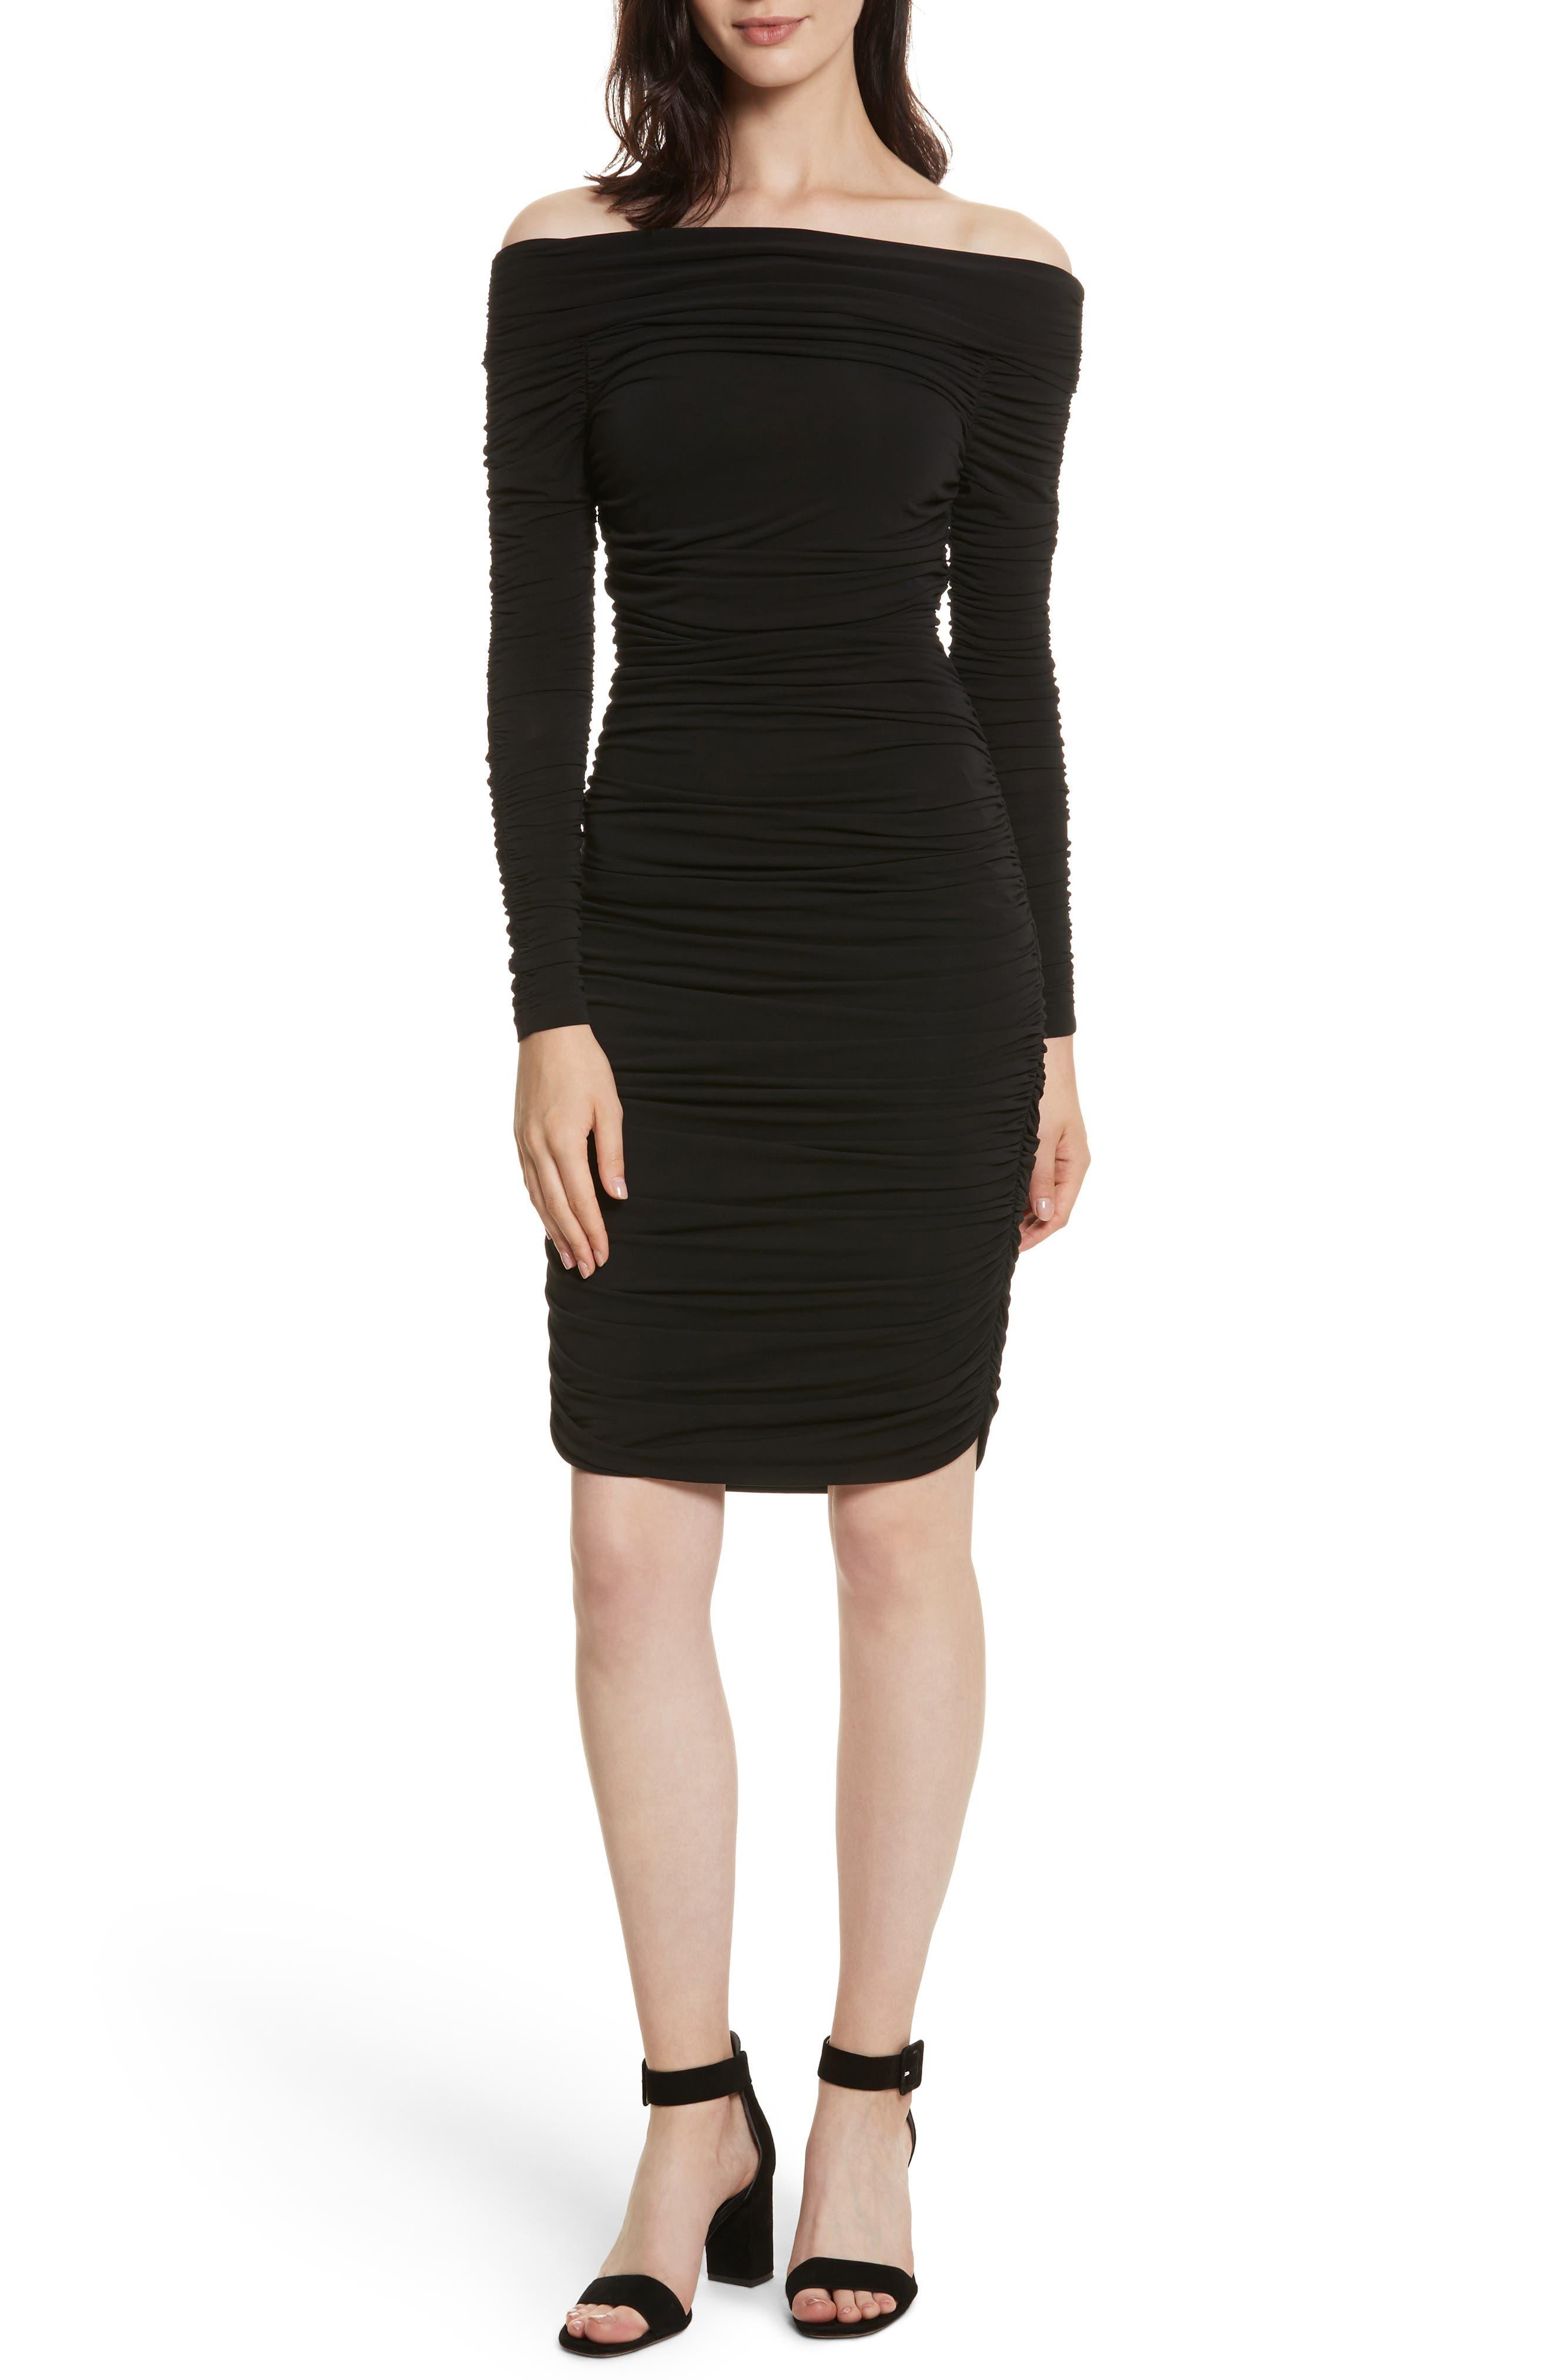 Blaise Off the Shoulder Ruched Dress,                         Main,                         color, Black